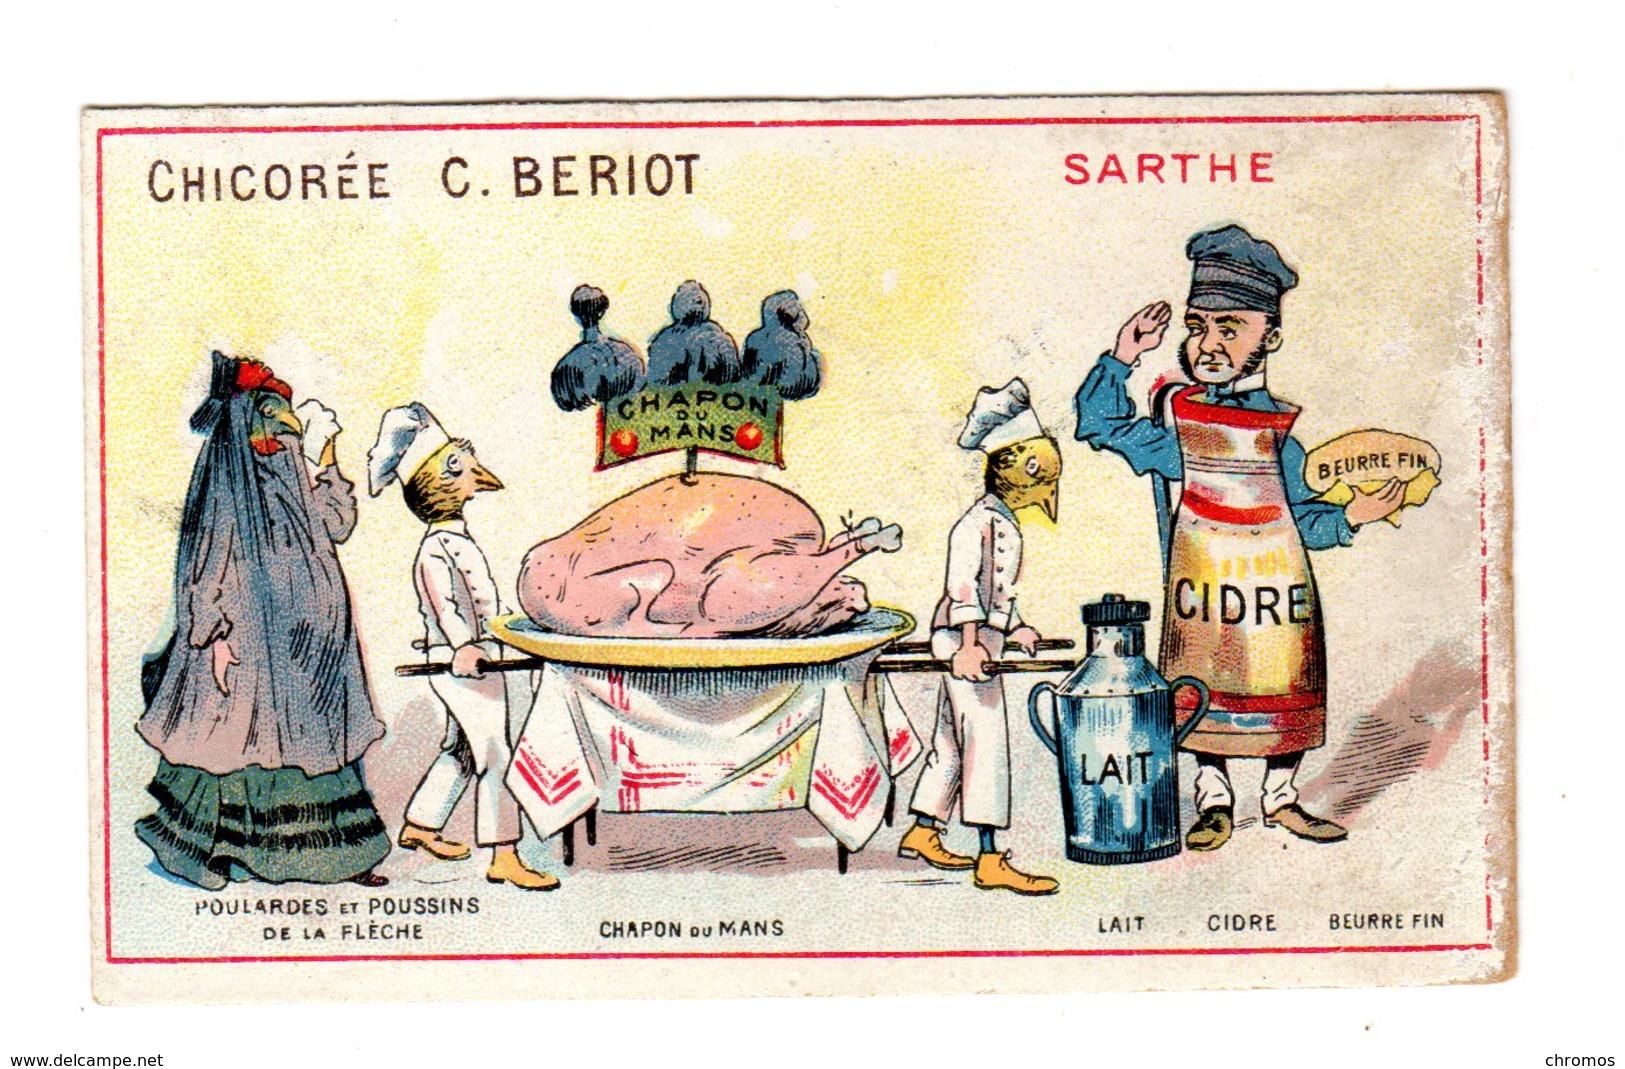 Chromo  France Gastronomique, Sarthe, Cidre..., Chicorée Bériot, Lille - Cromos